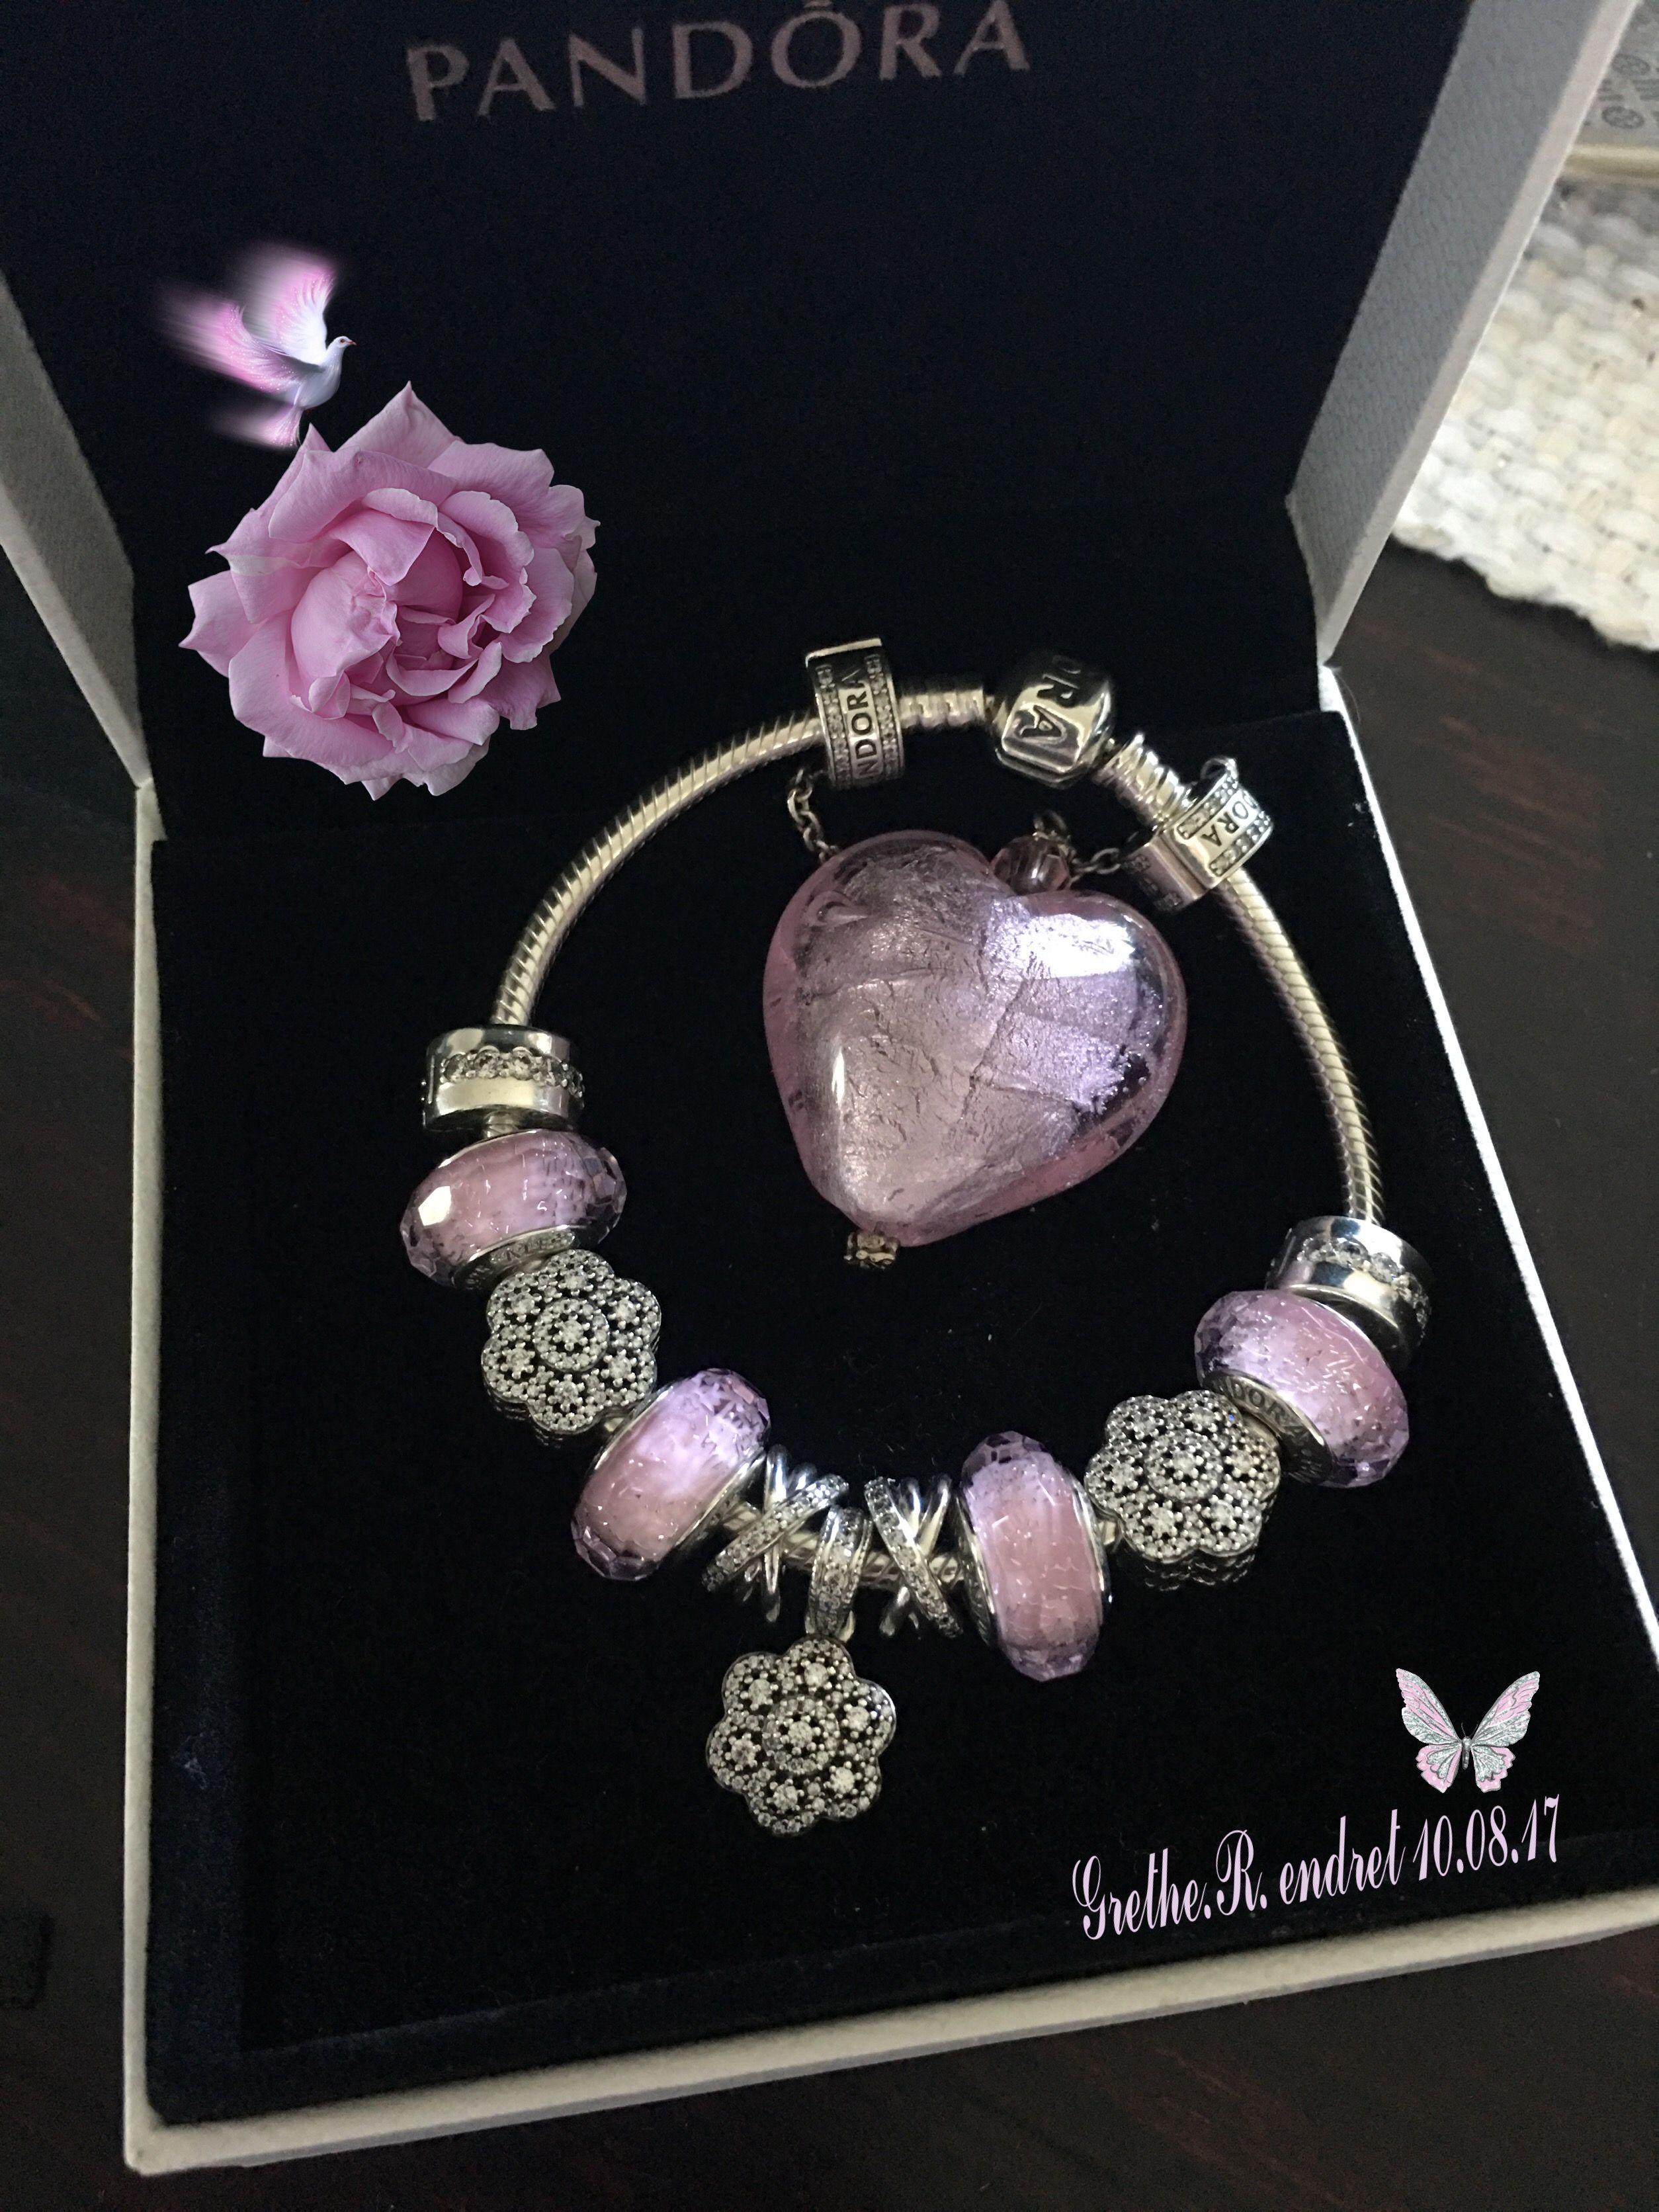 Pin by Nizla Noor on Pandora | Pinterest | Bracelets, Pandora charm ...